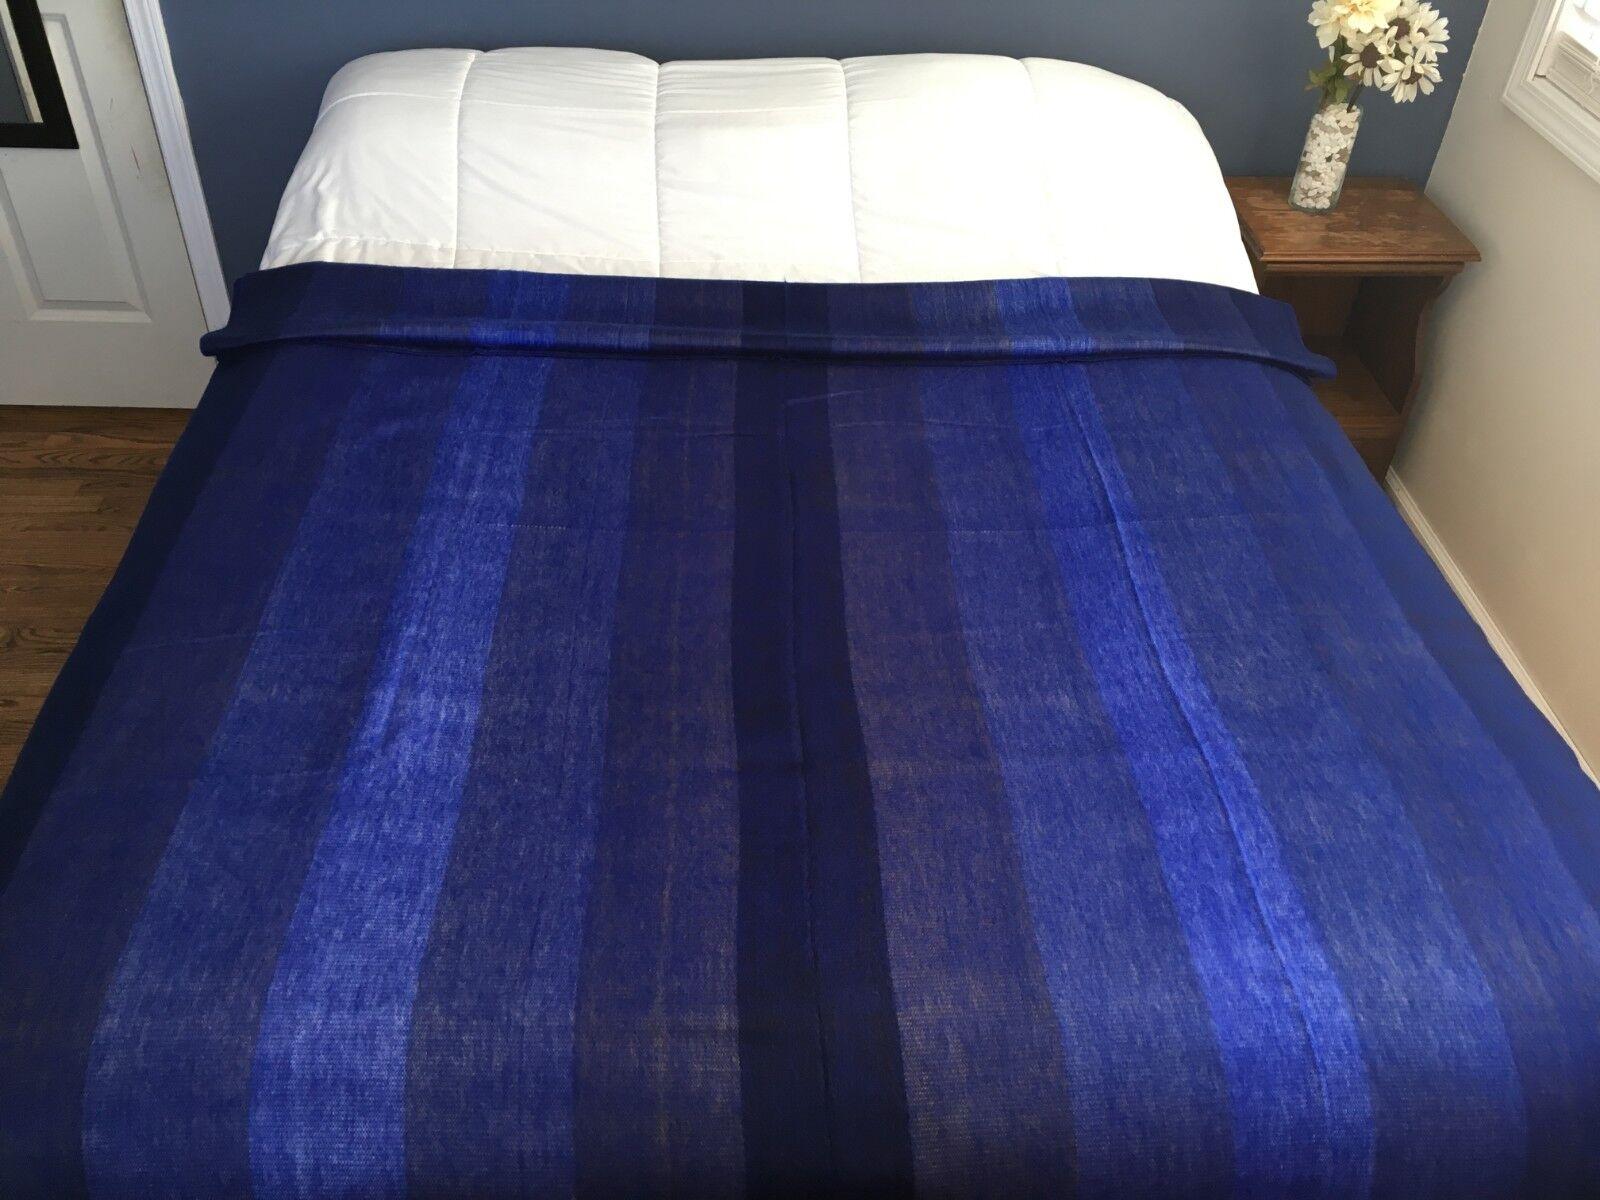 Handmade Alpaca Blanket - Various shades of bluee, Full Queen90  x 70